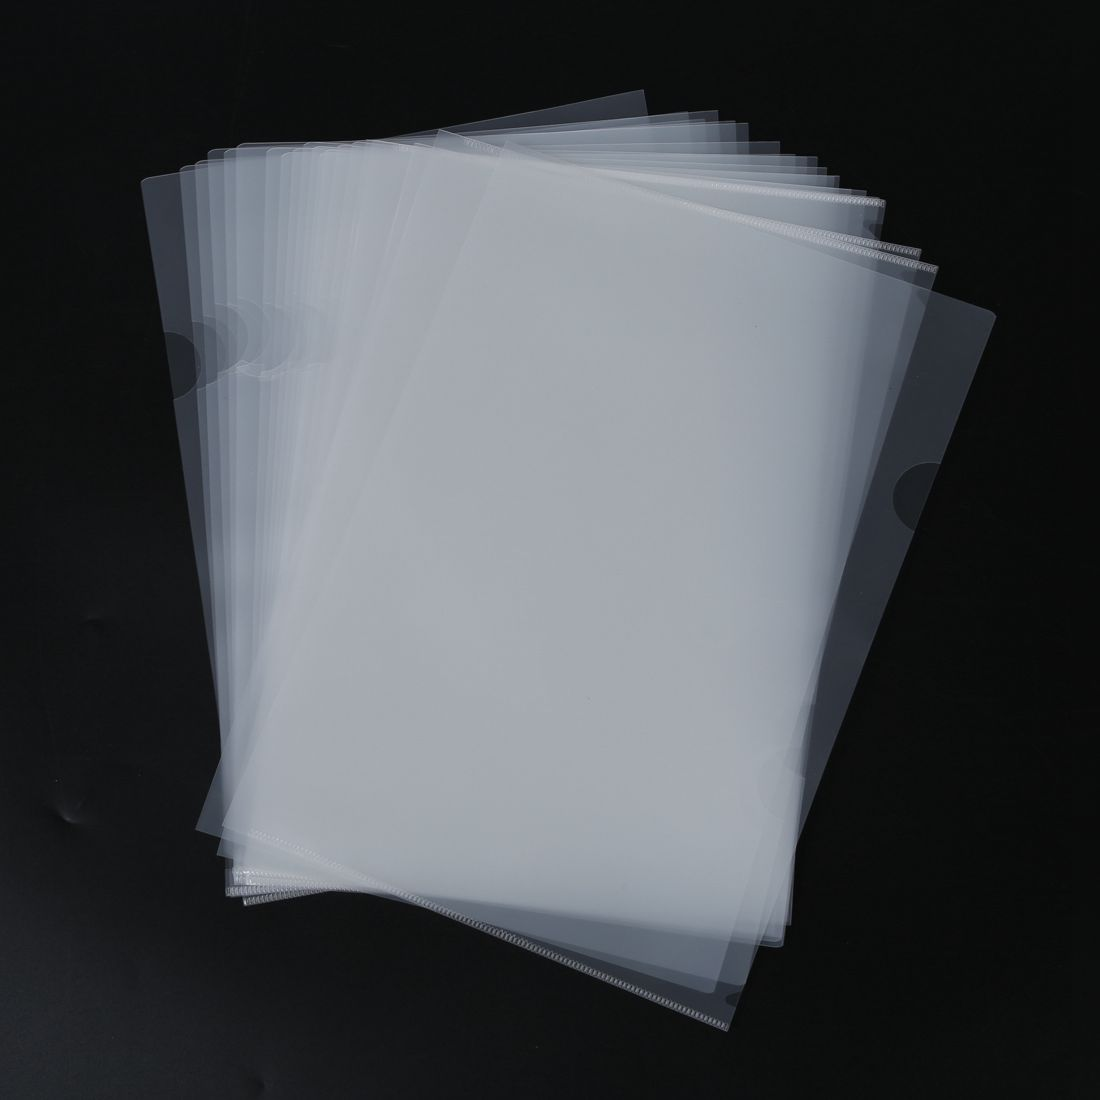 20 Pcs Reuseable Clear File Folder Holder for A4 Paper Document